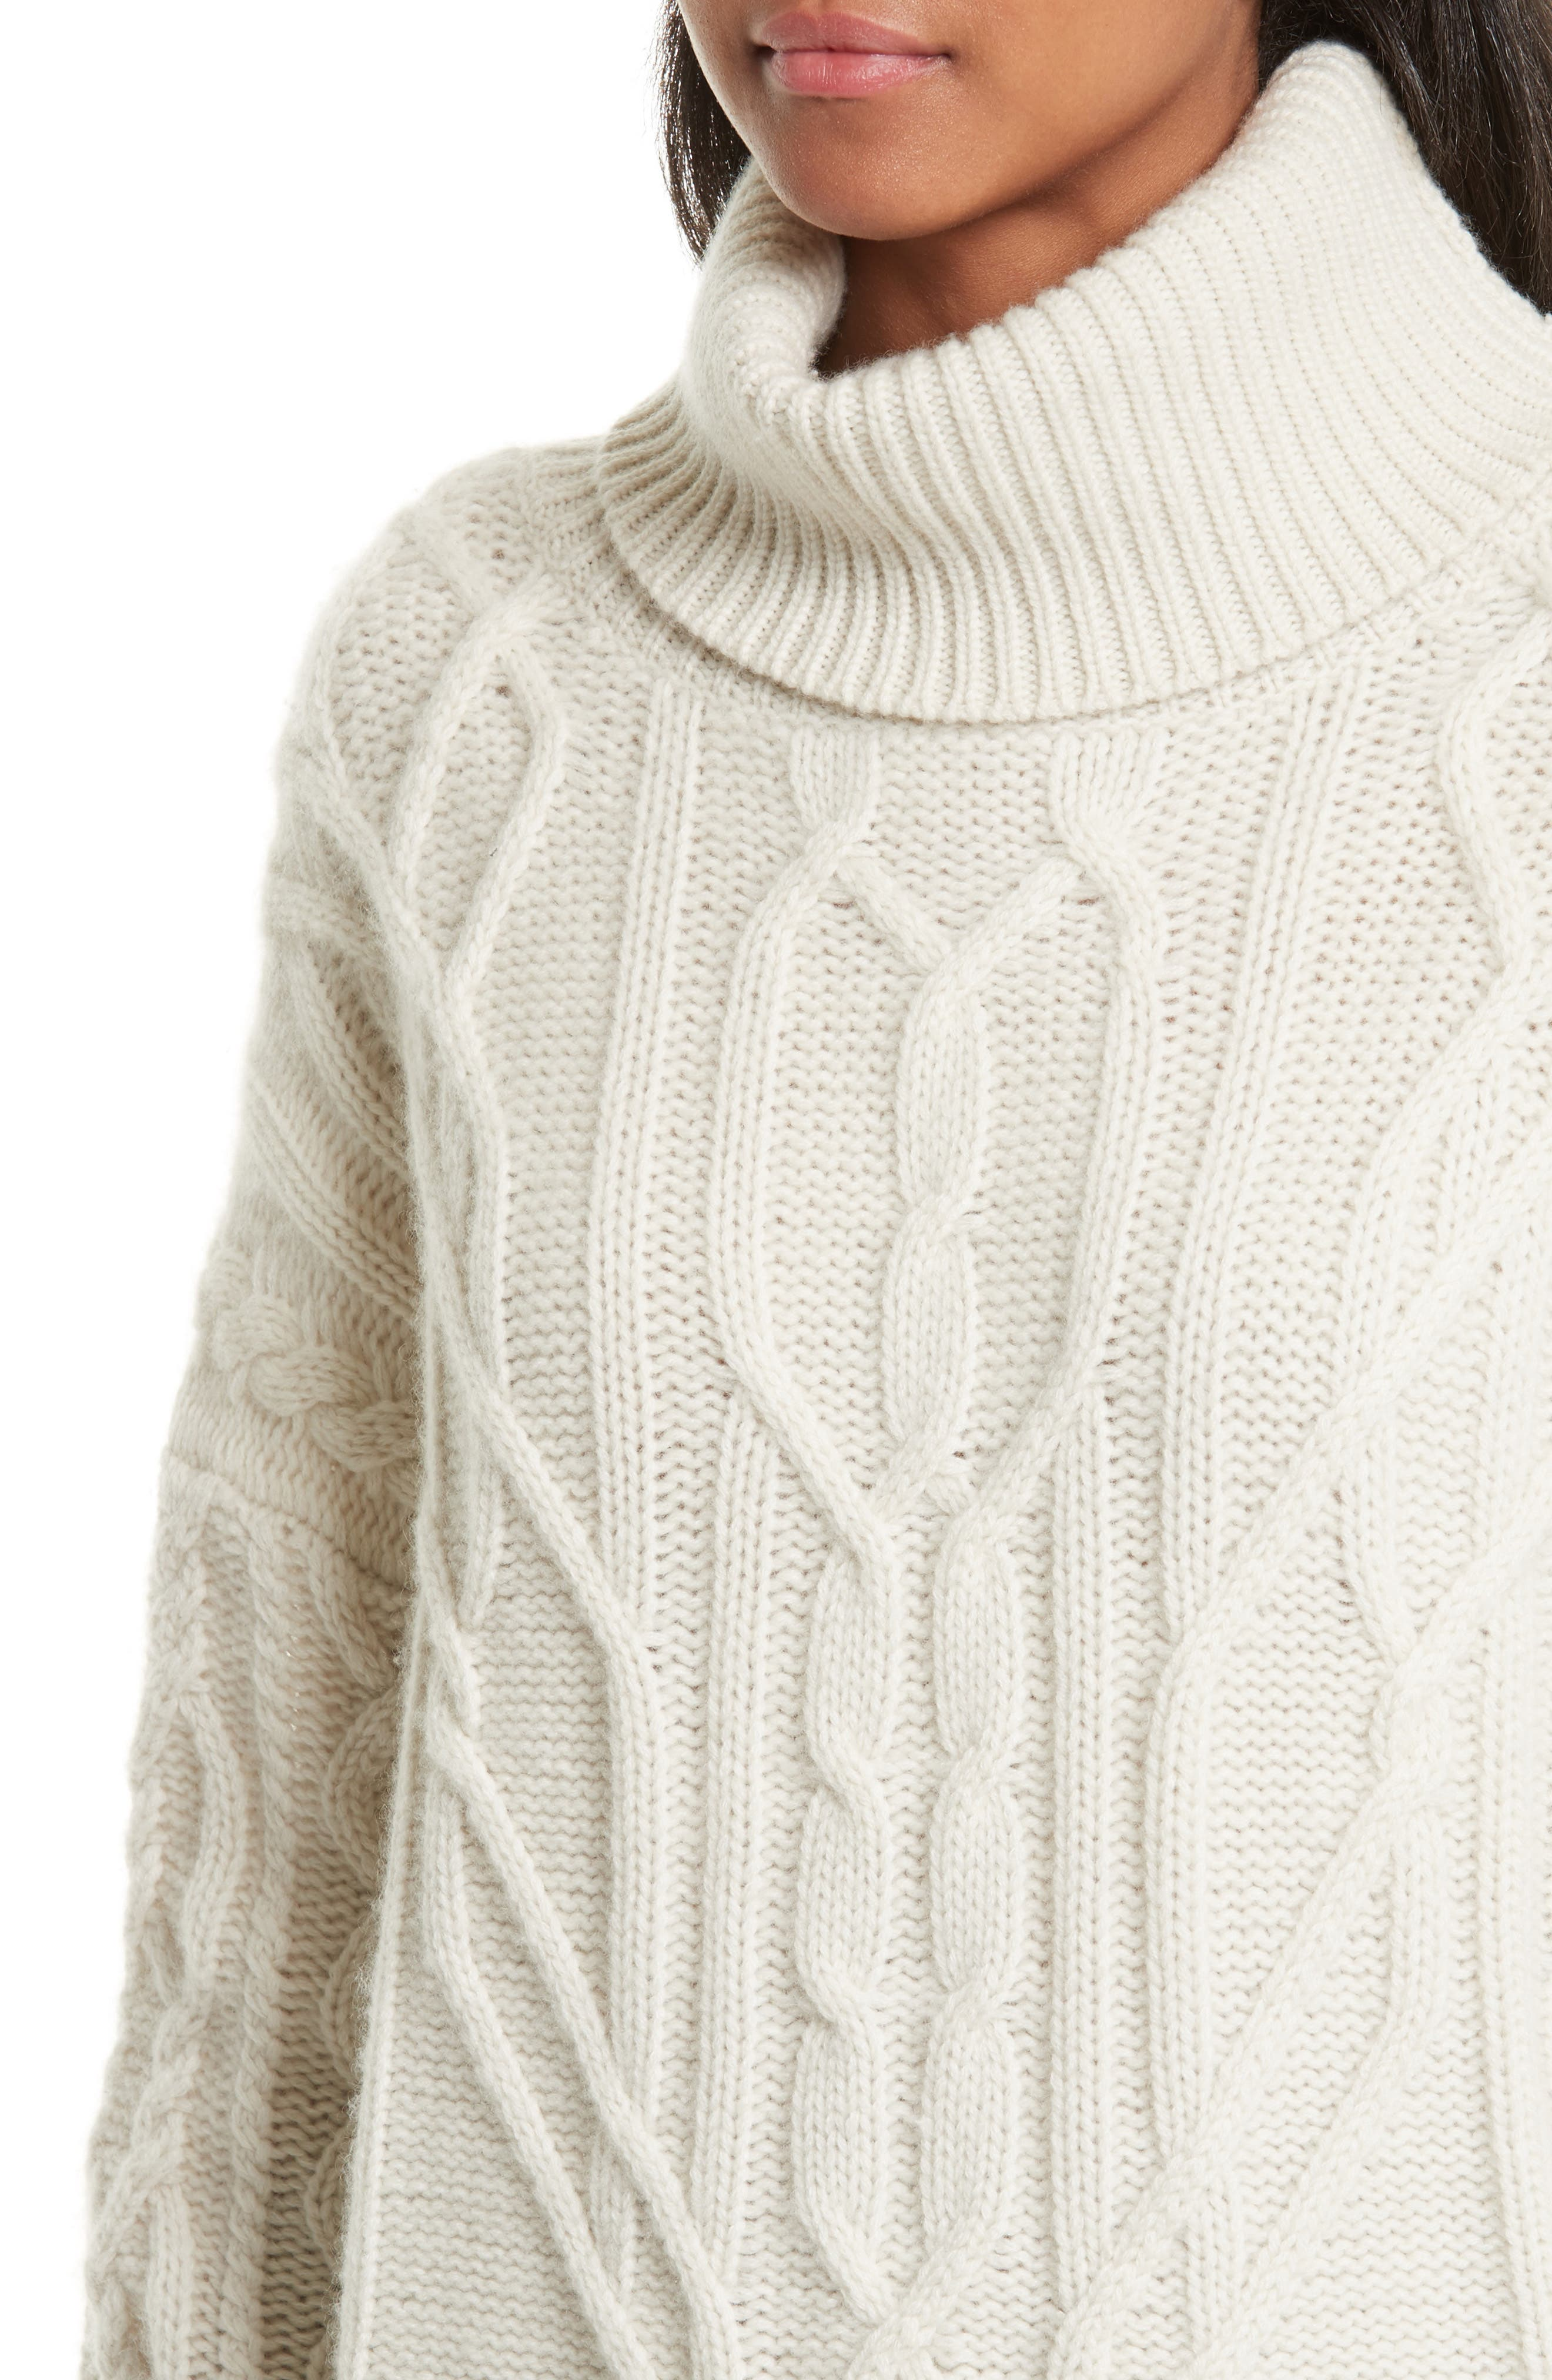 Cecil Cable Knit Cashmere Turtleneck Sweater,                             Alternate thumbnail 4, color,                             902